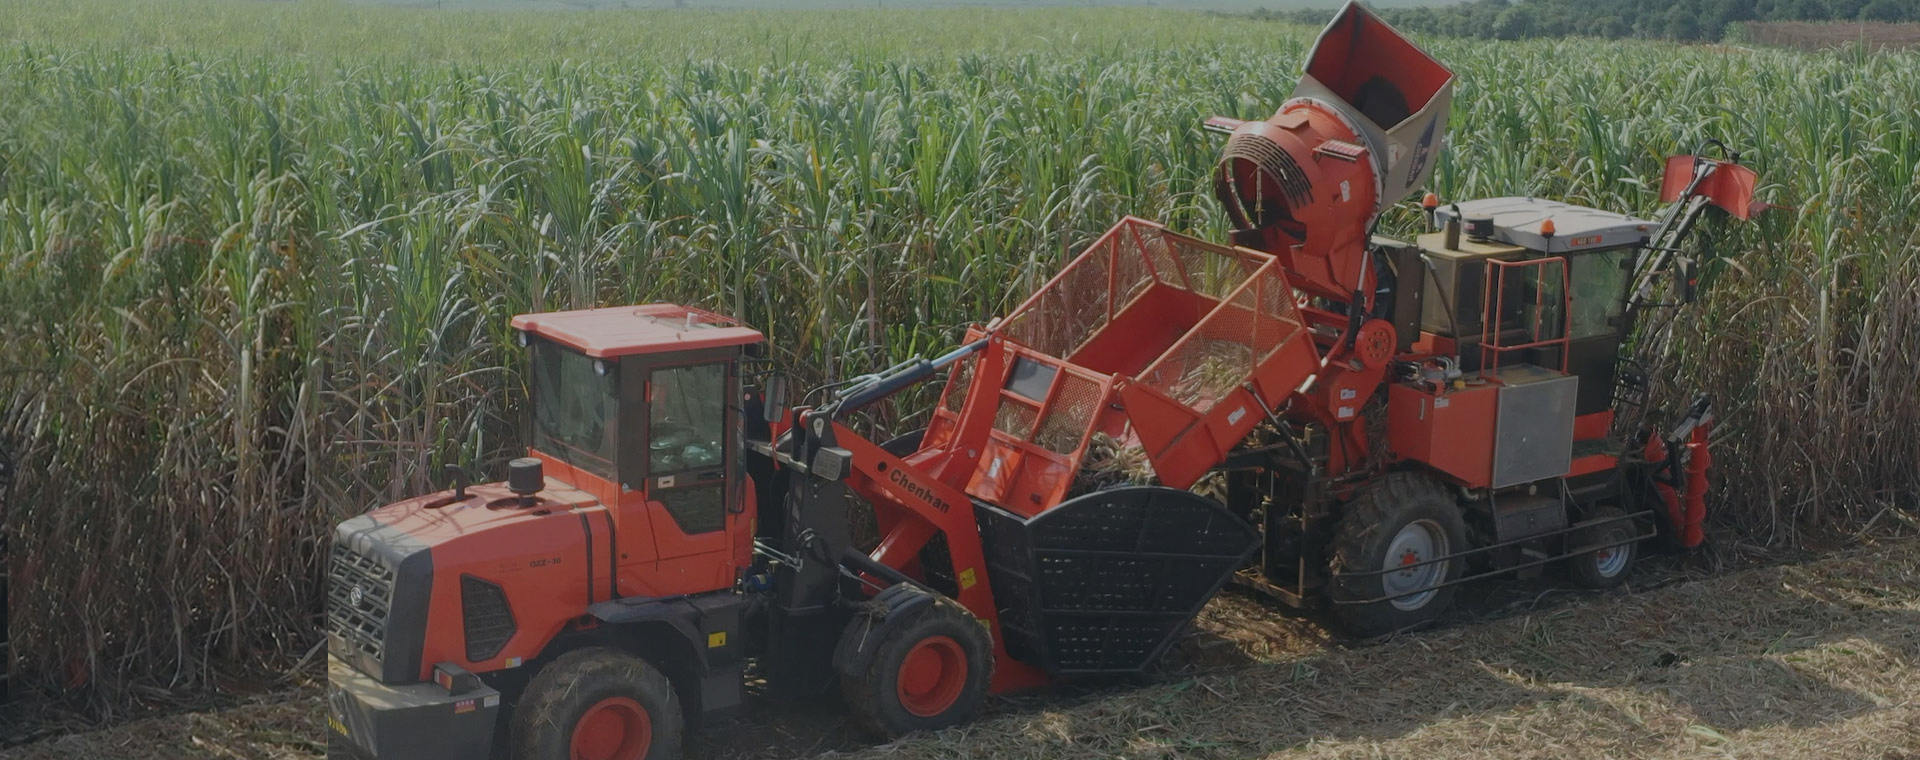 Chenhan Sugarcane Harvesting Mechanization